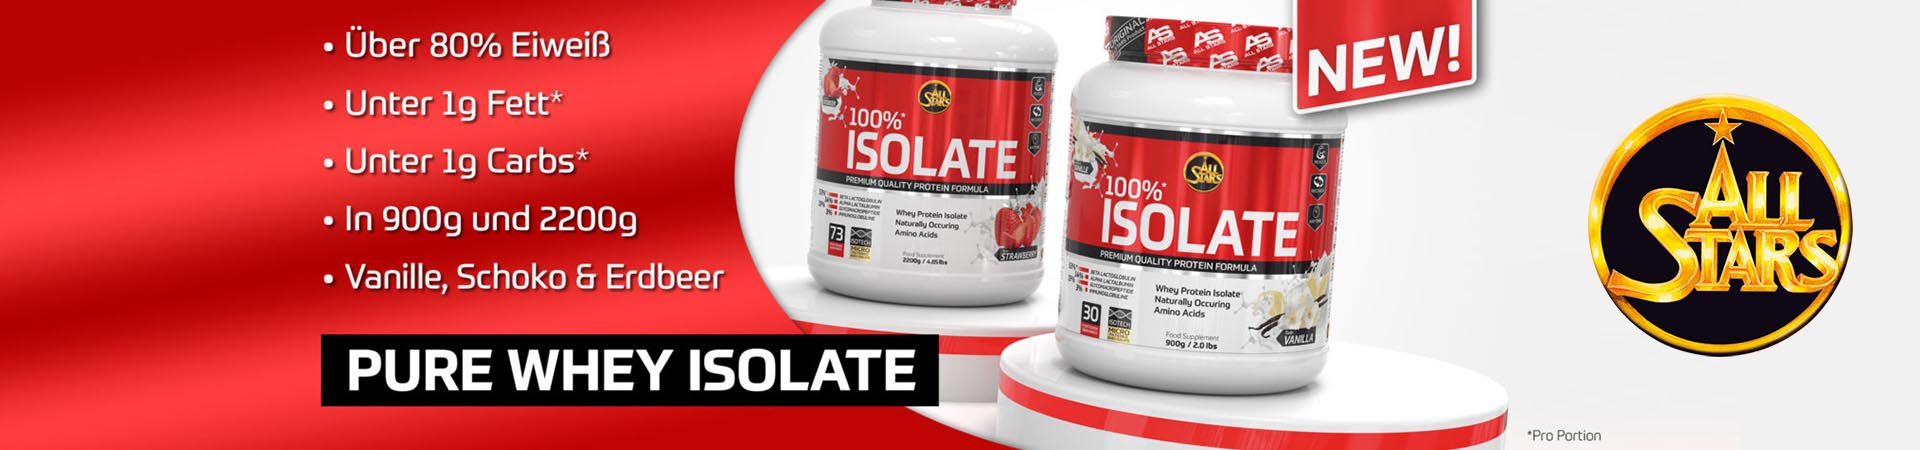 Allstars 100% Isolate